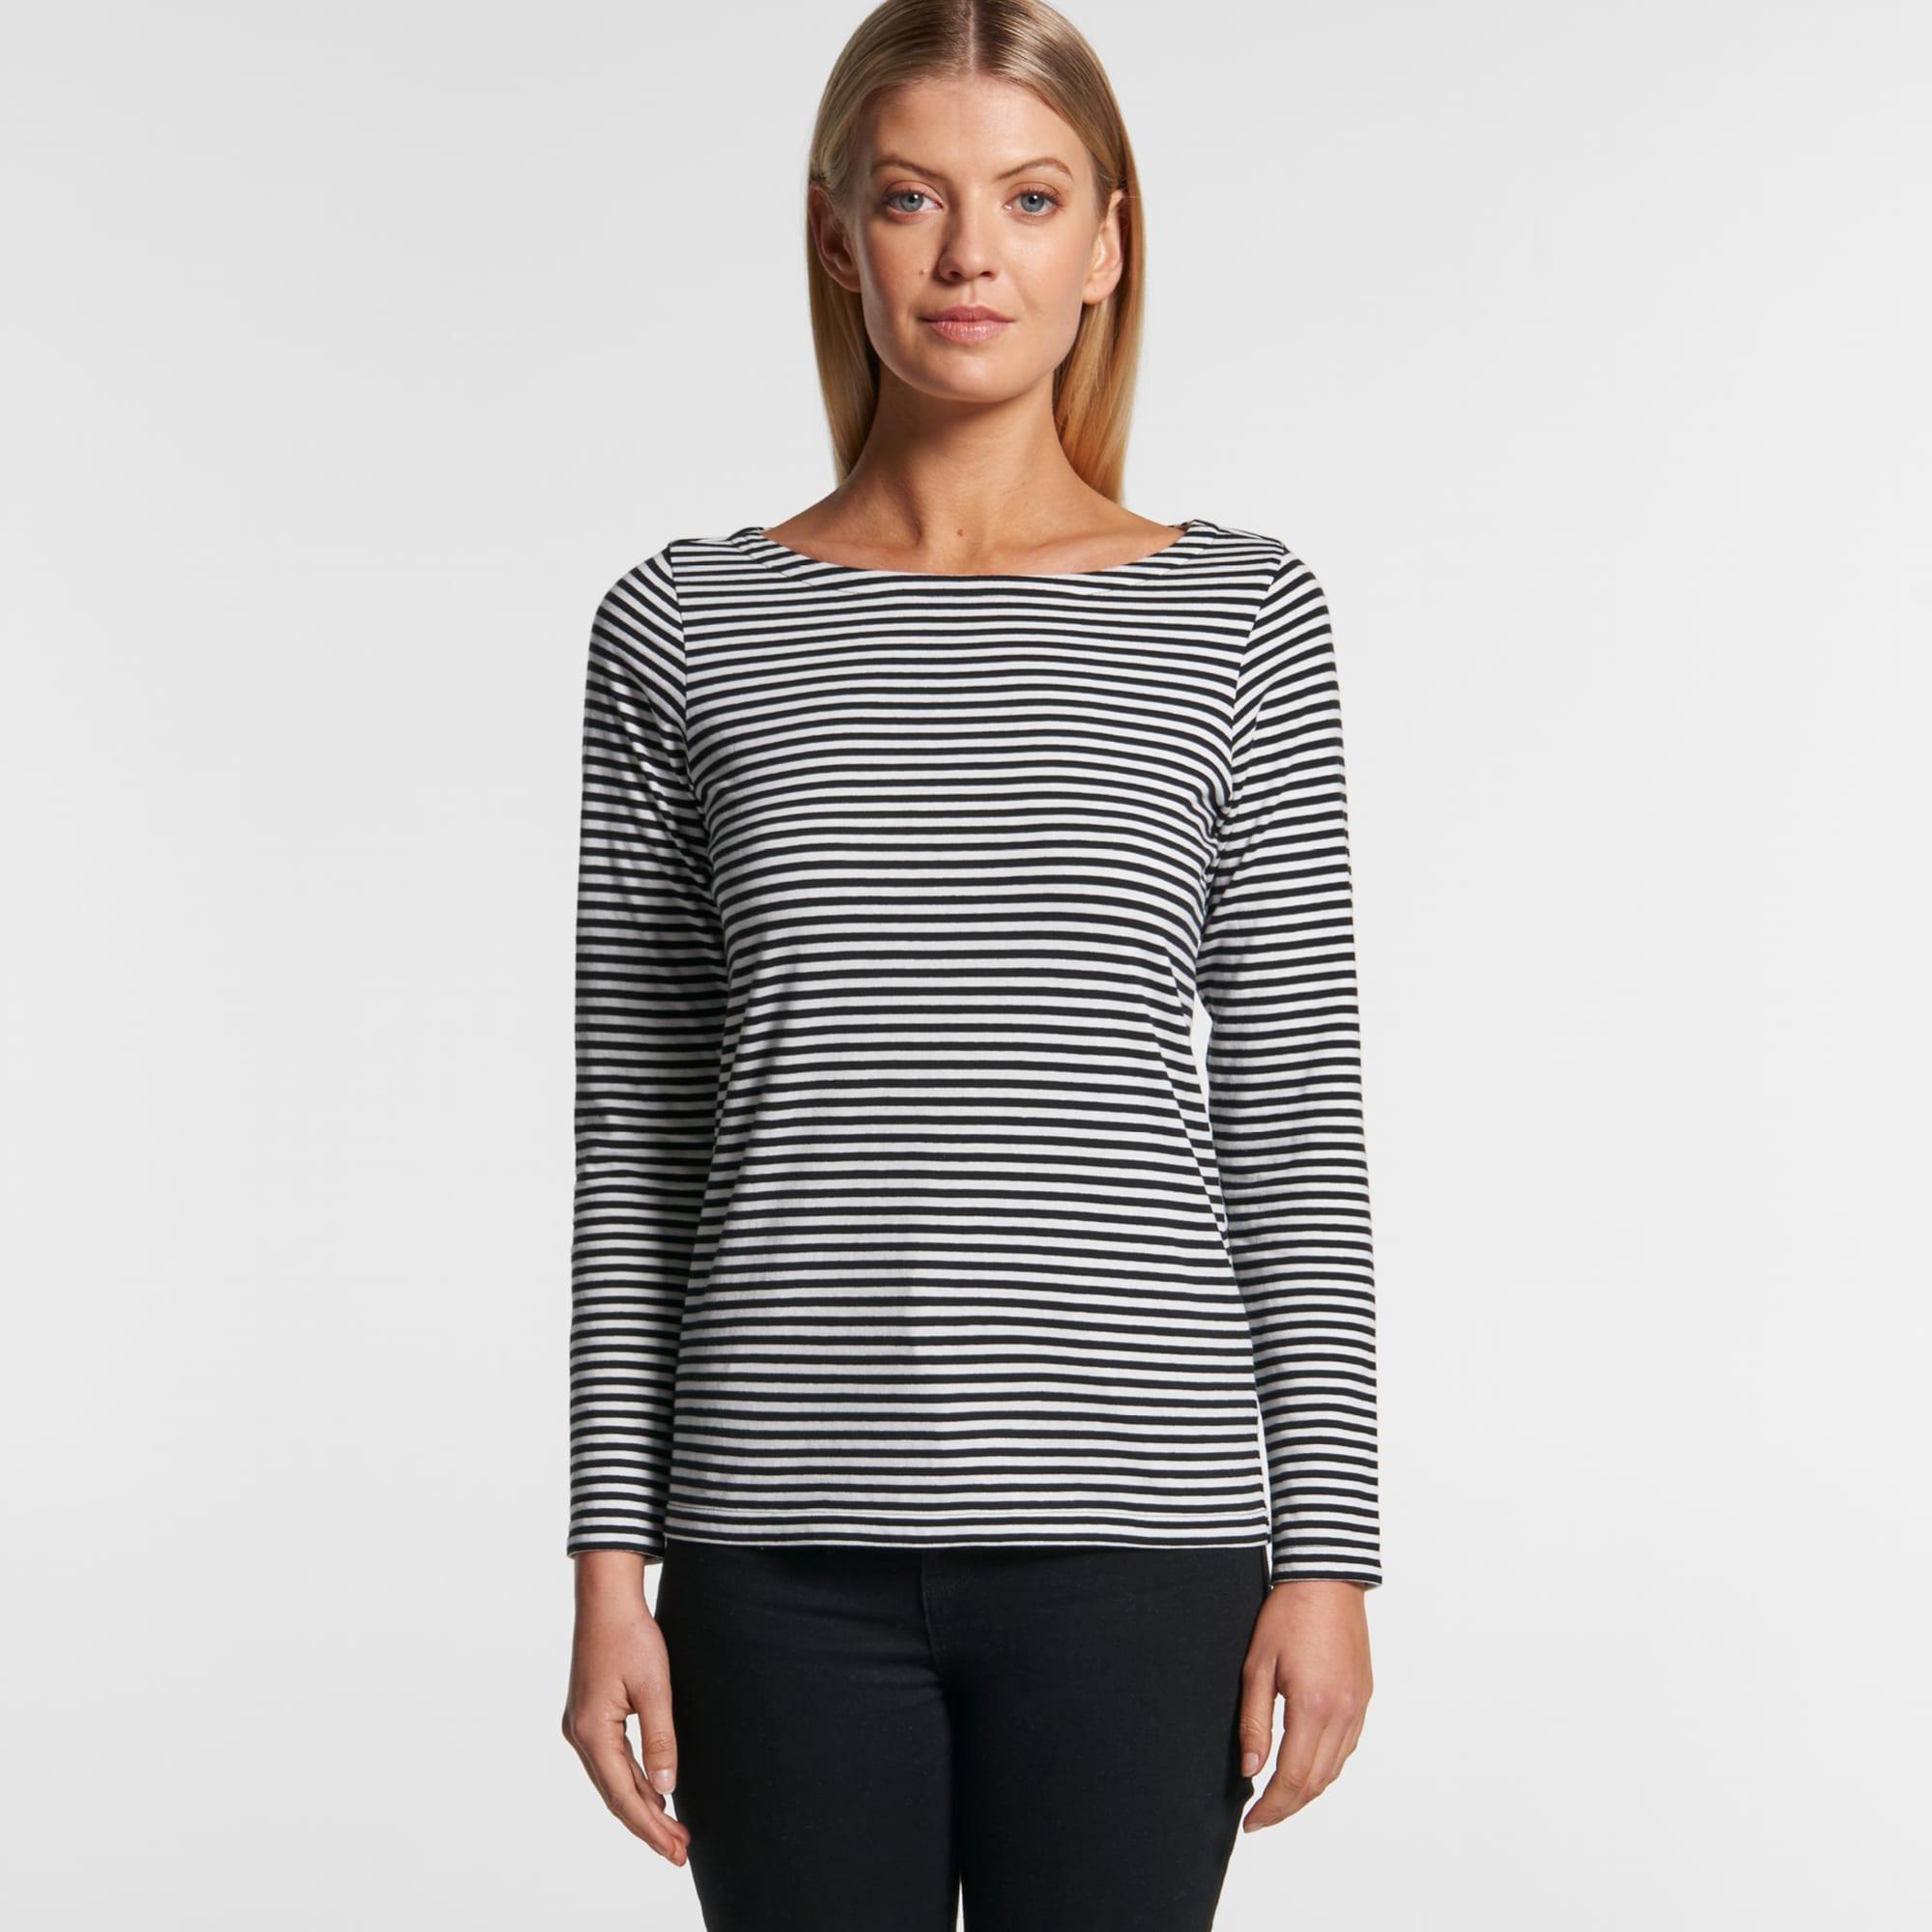 AS 4061 Womens Bowery Stripe L/S Tee